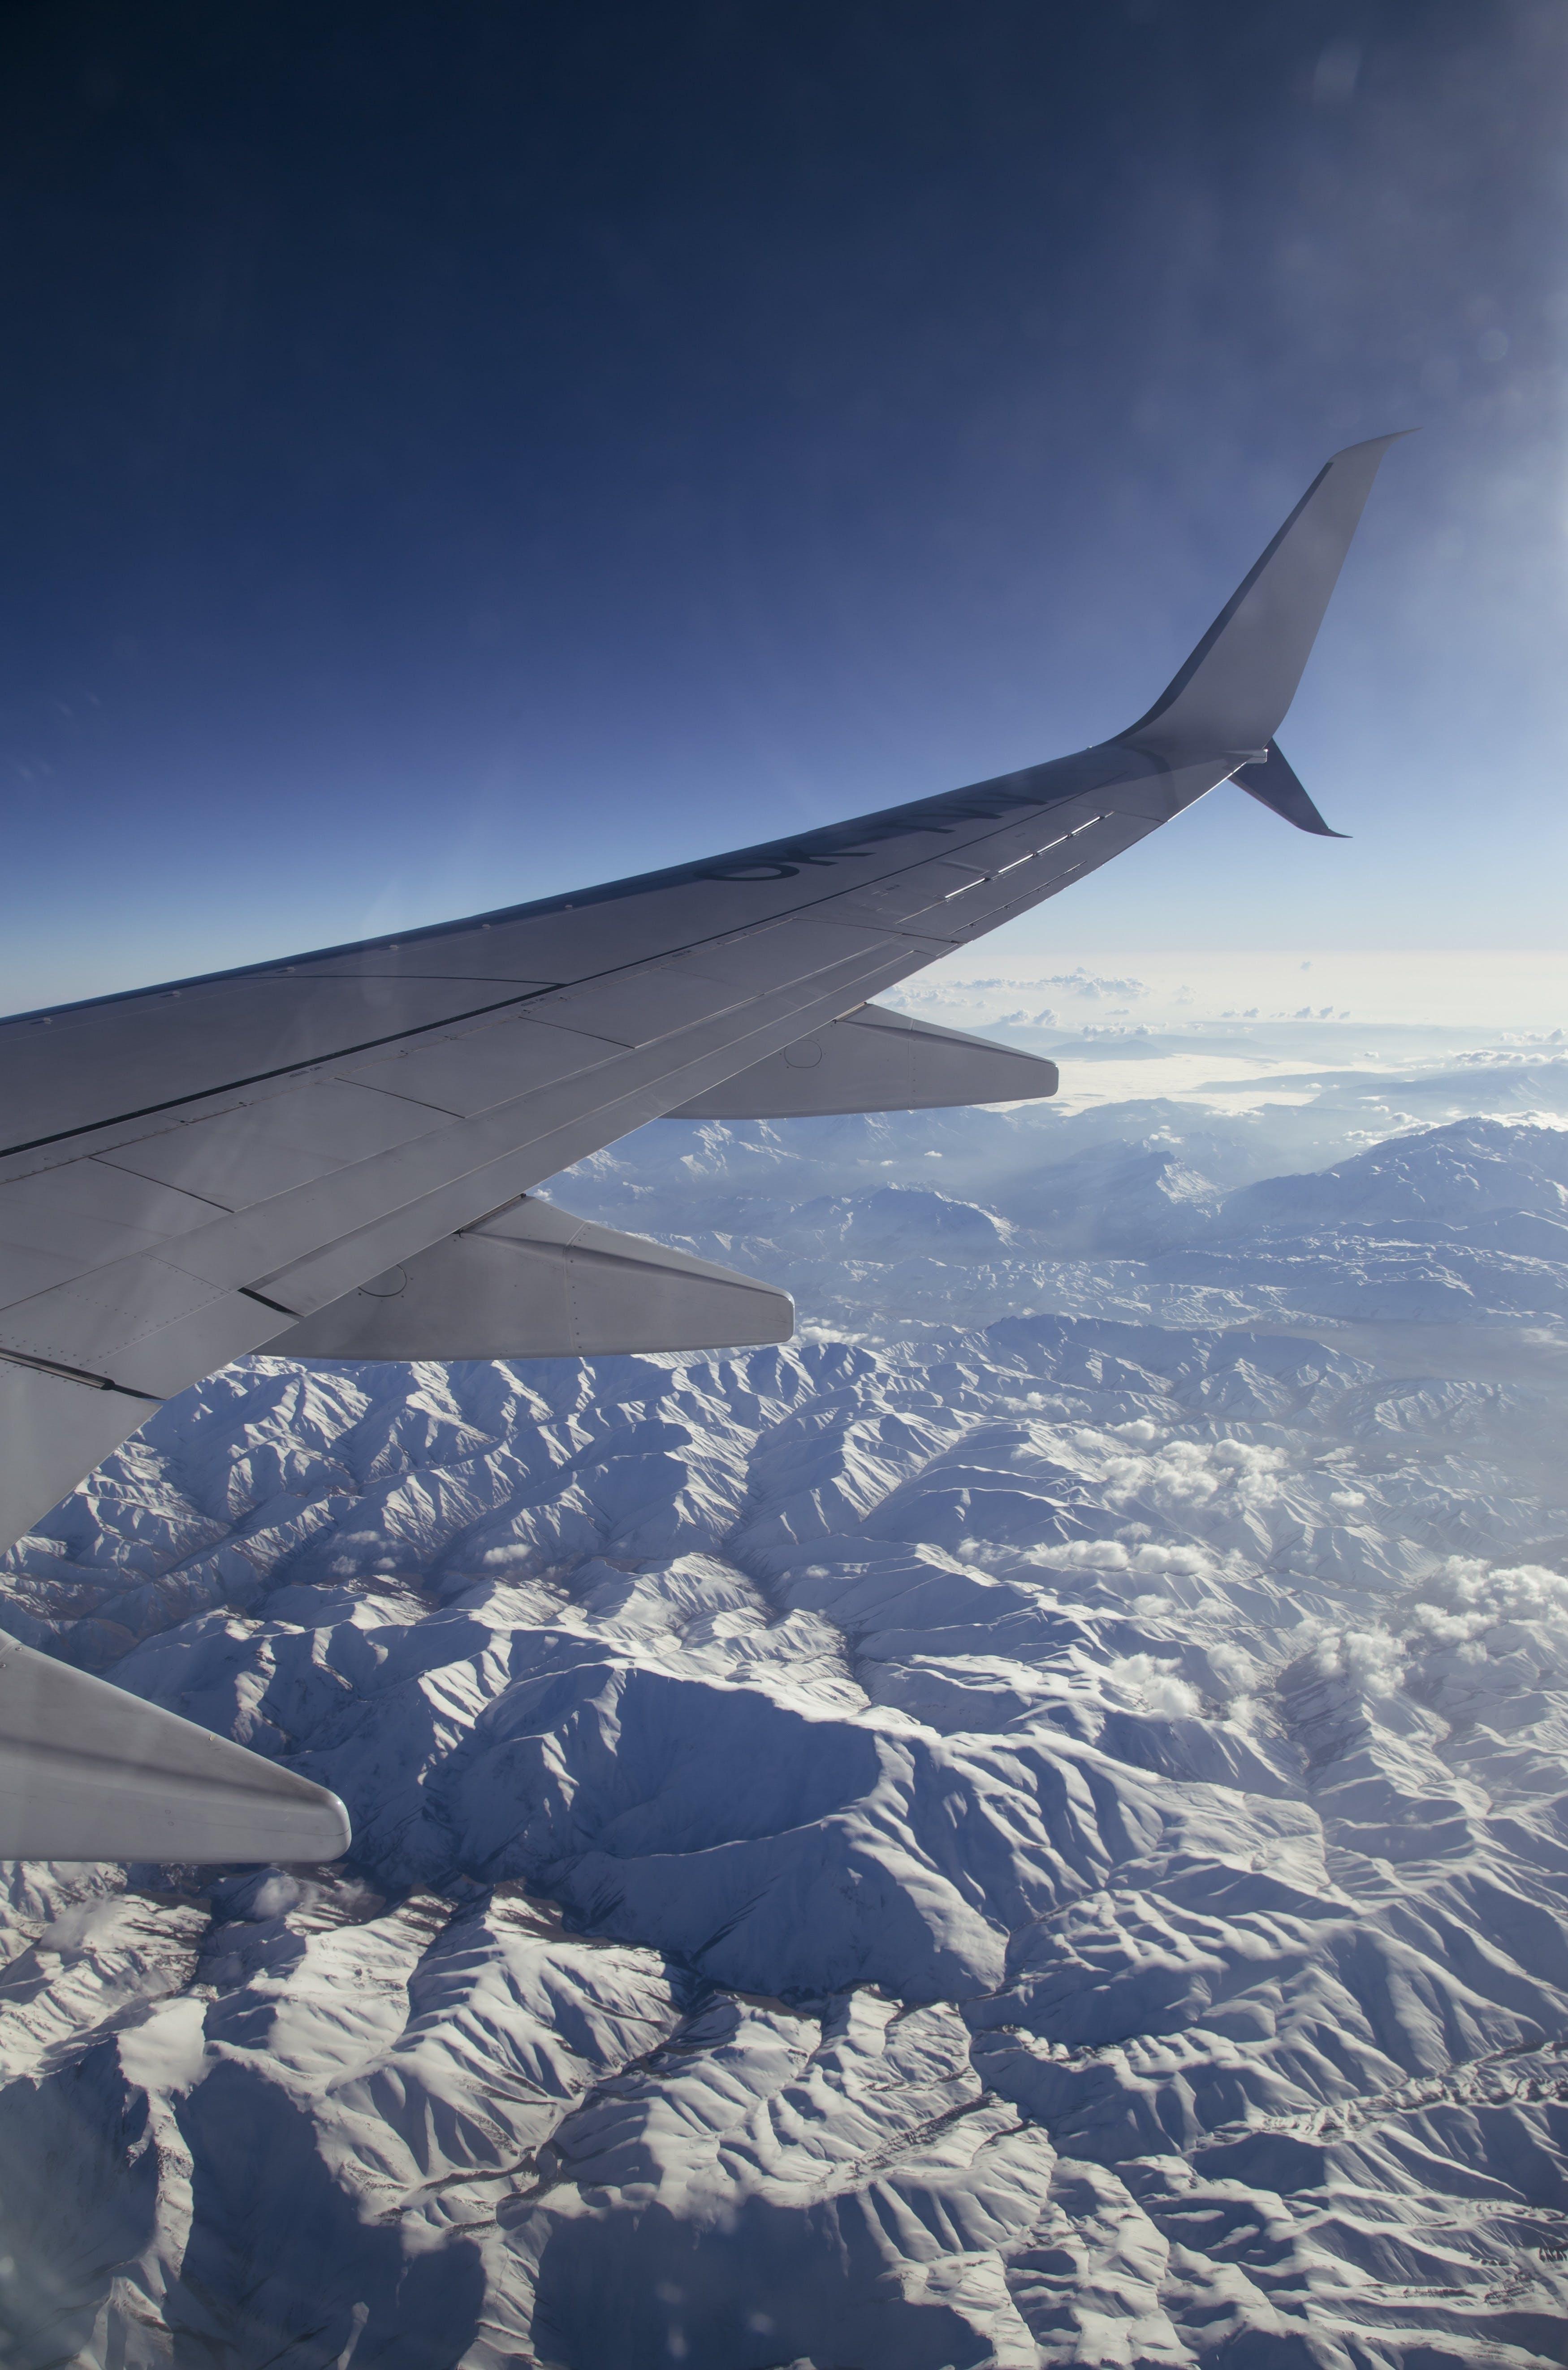 Free stock photo of snow, flight, mountains, sky